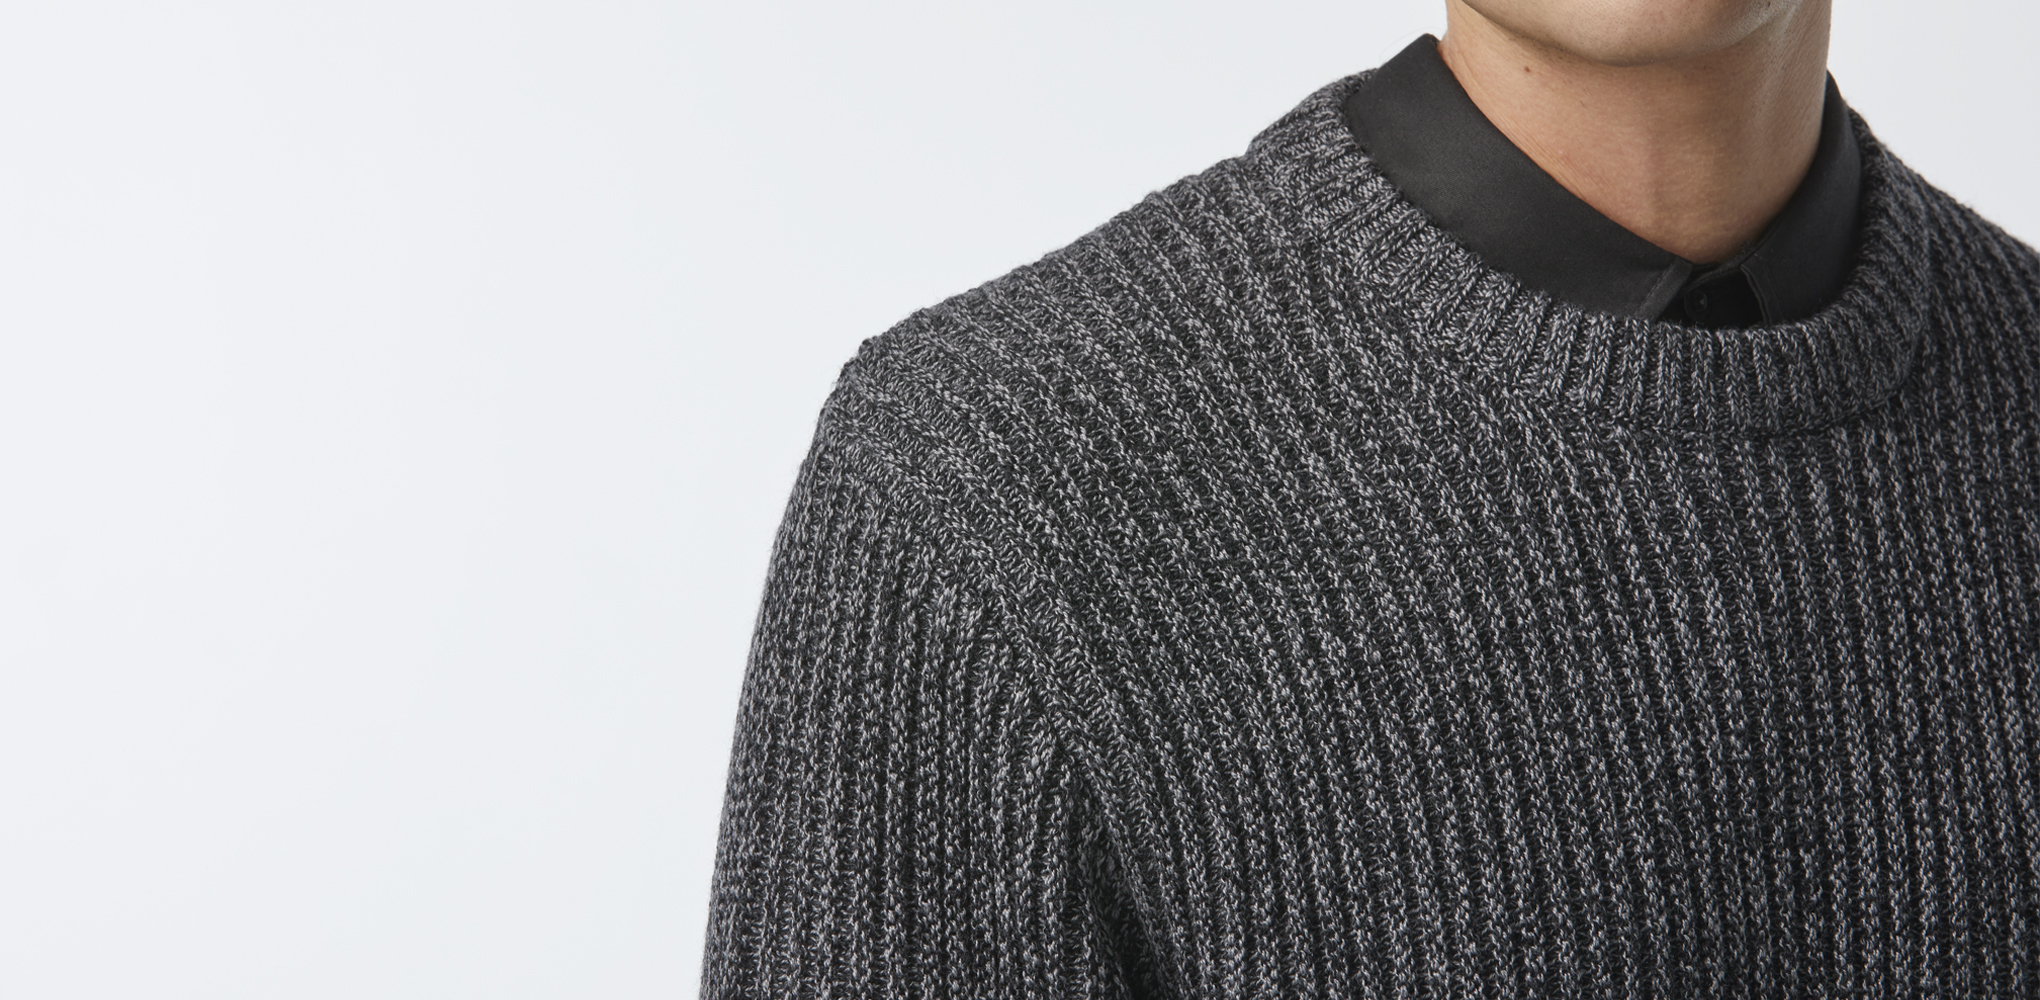 Knit-Web.jpg